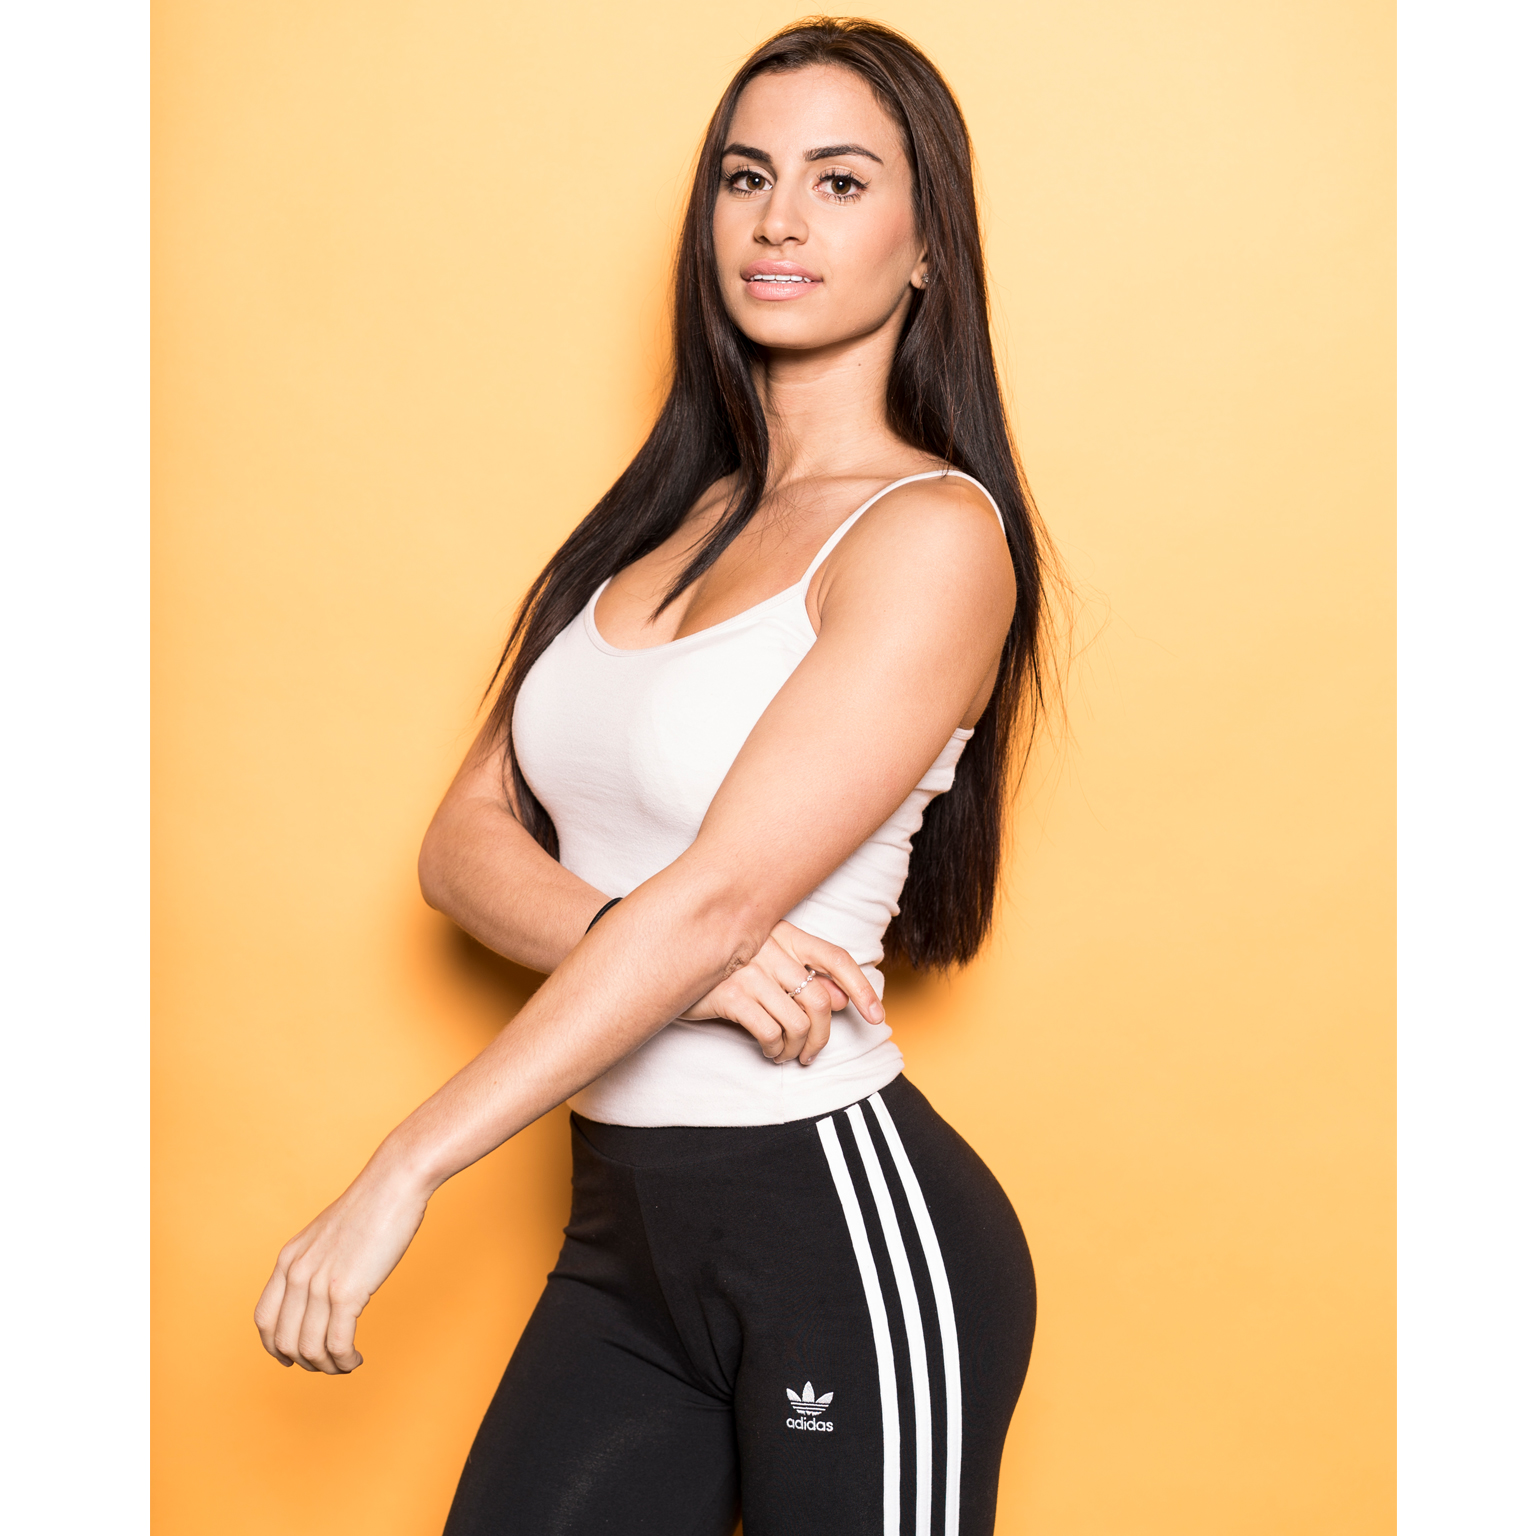 Toronto-Fitness-Model-Agency-Adidas-Commercial-Portrait-Elizabeth-Ruffolo